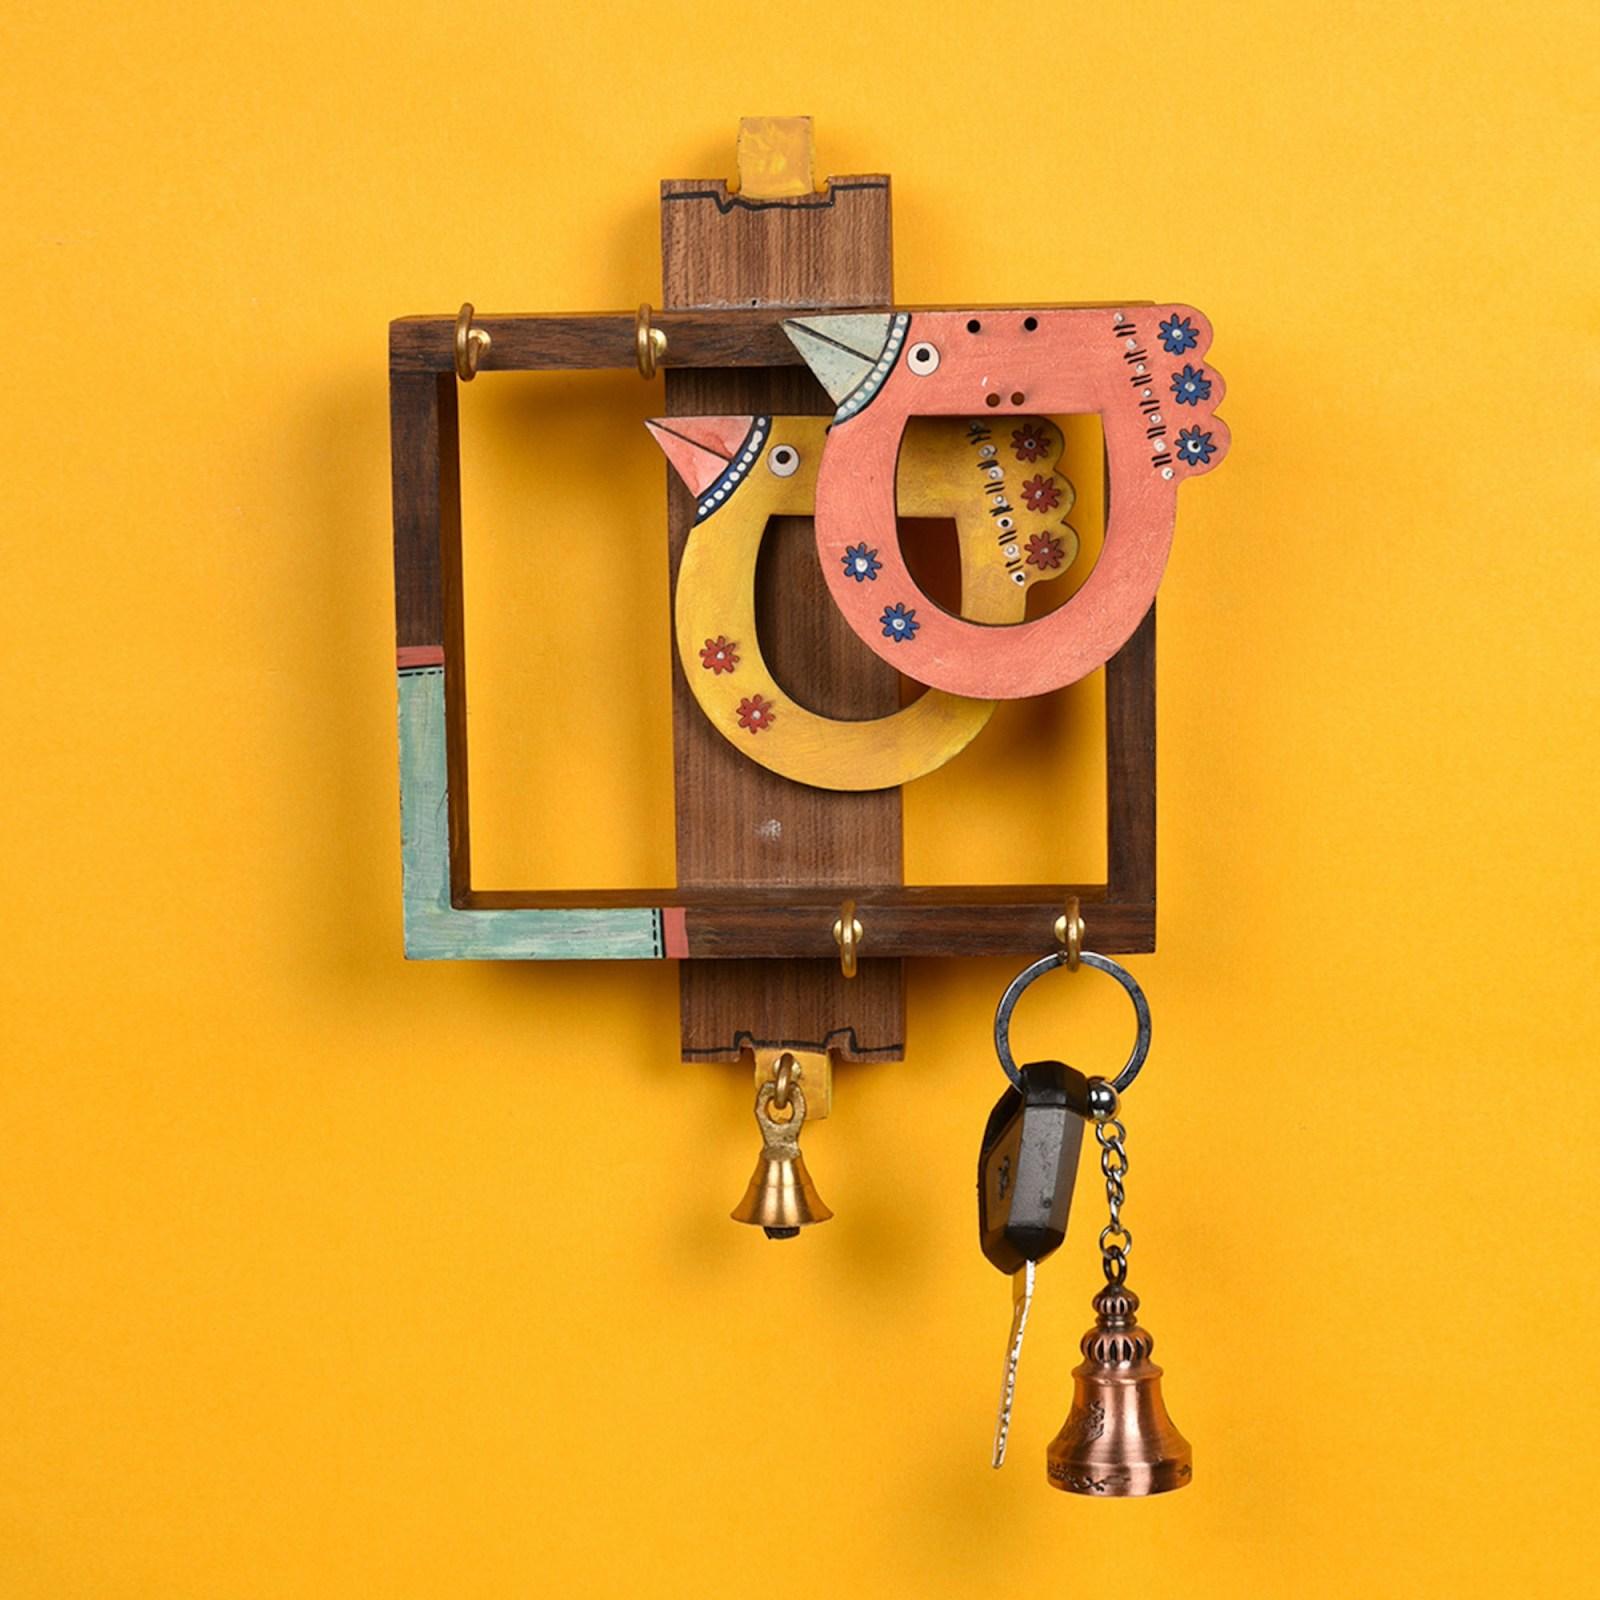 Handcrafted Key Hanger for Decoration